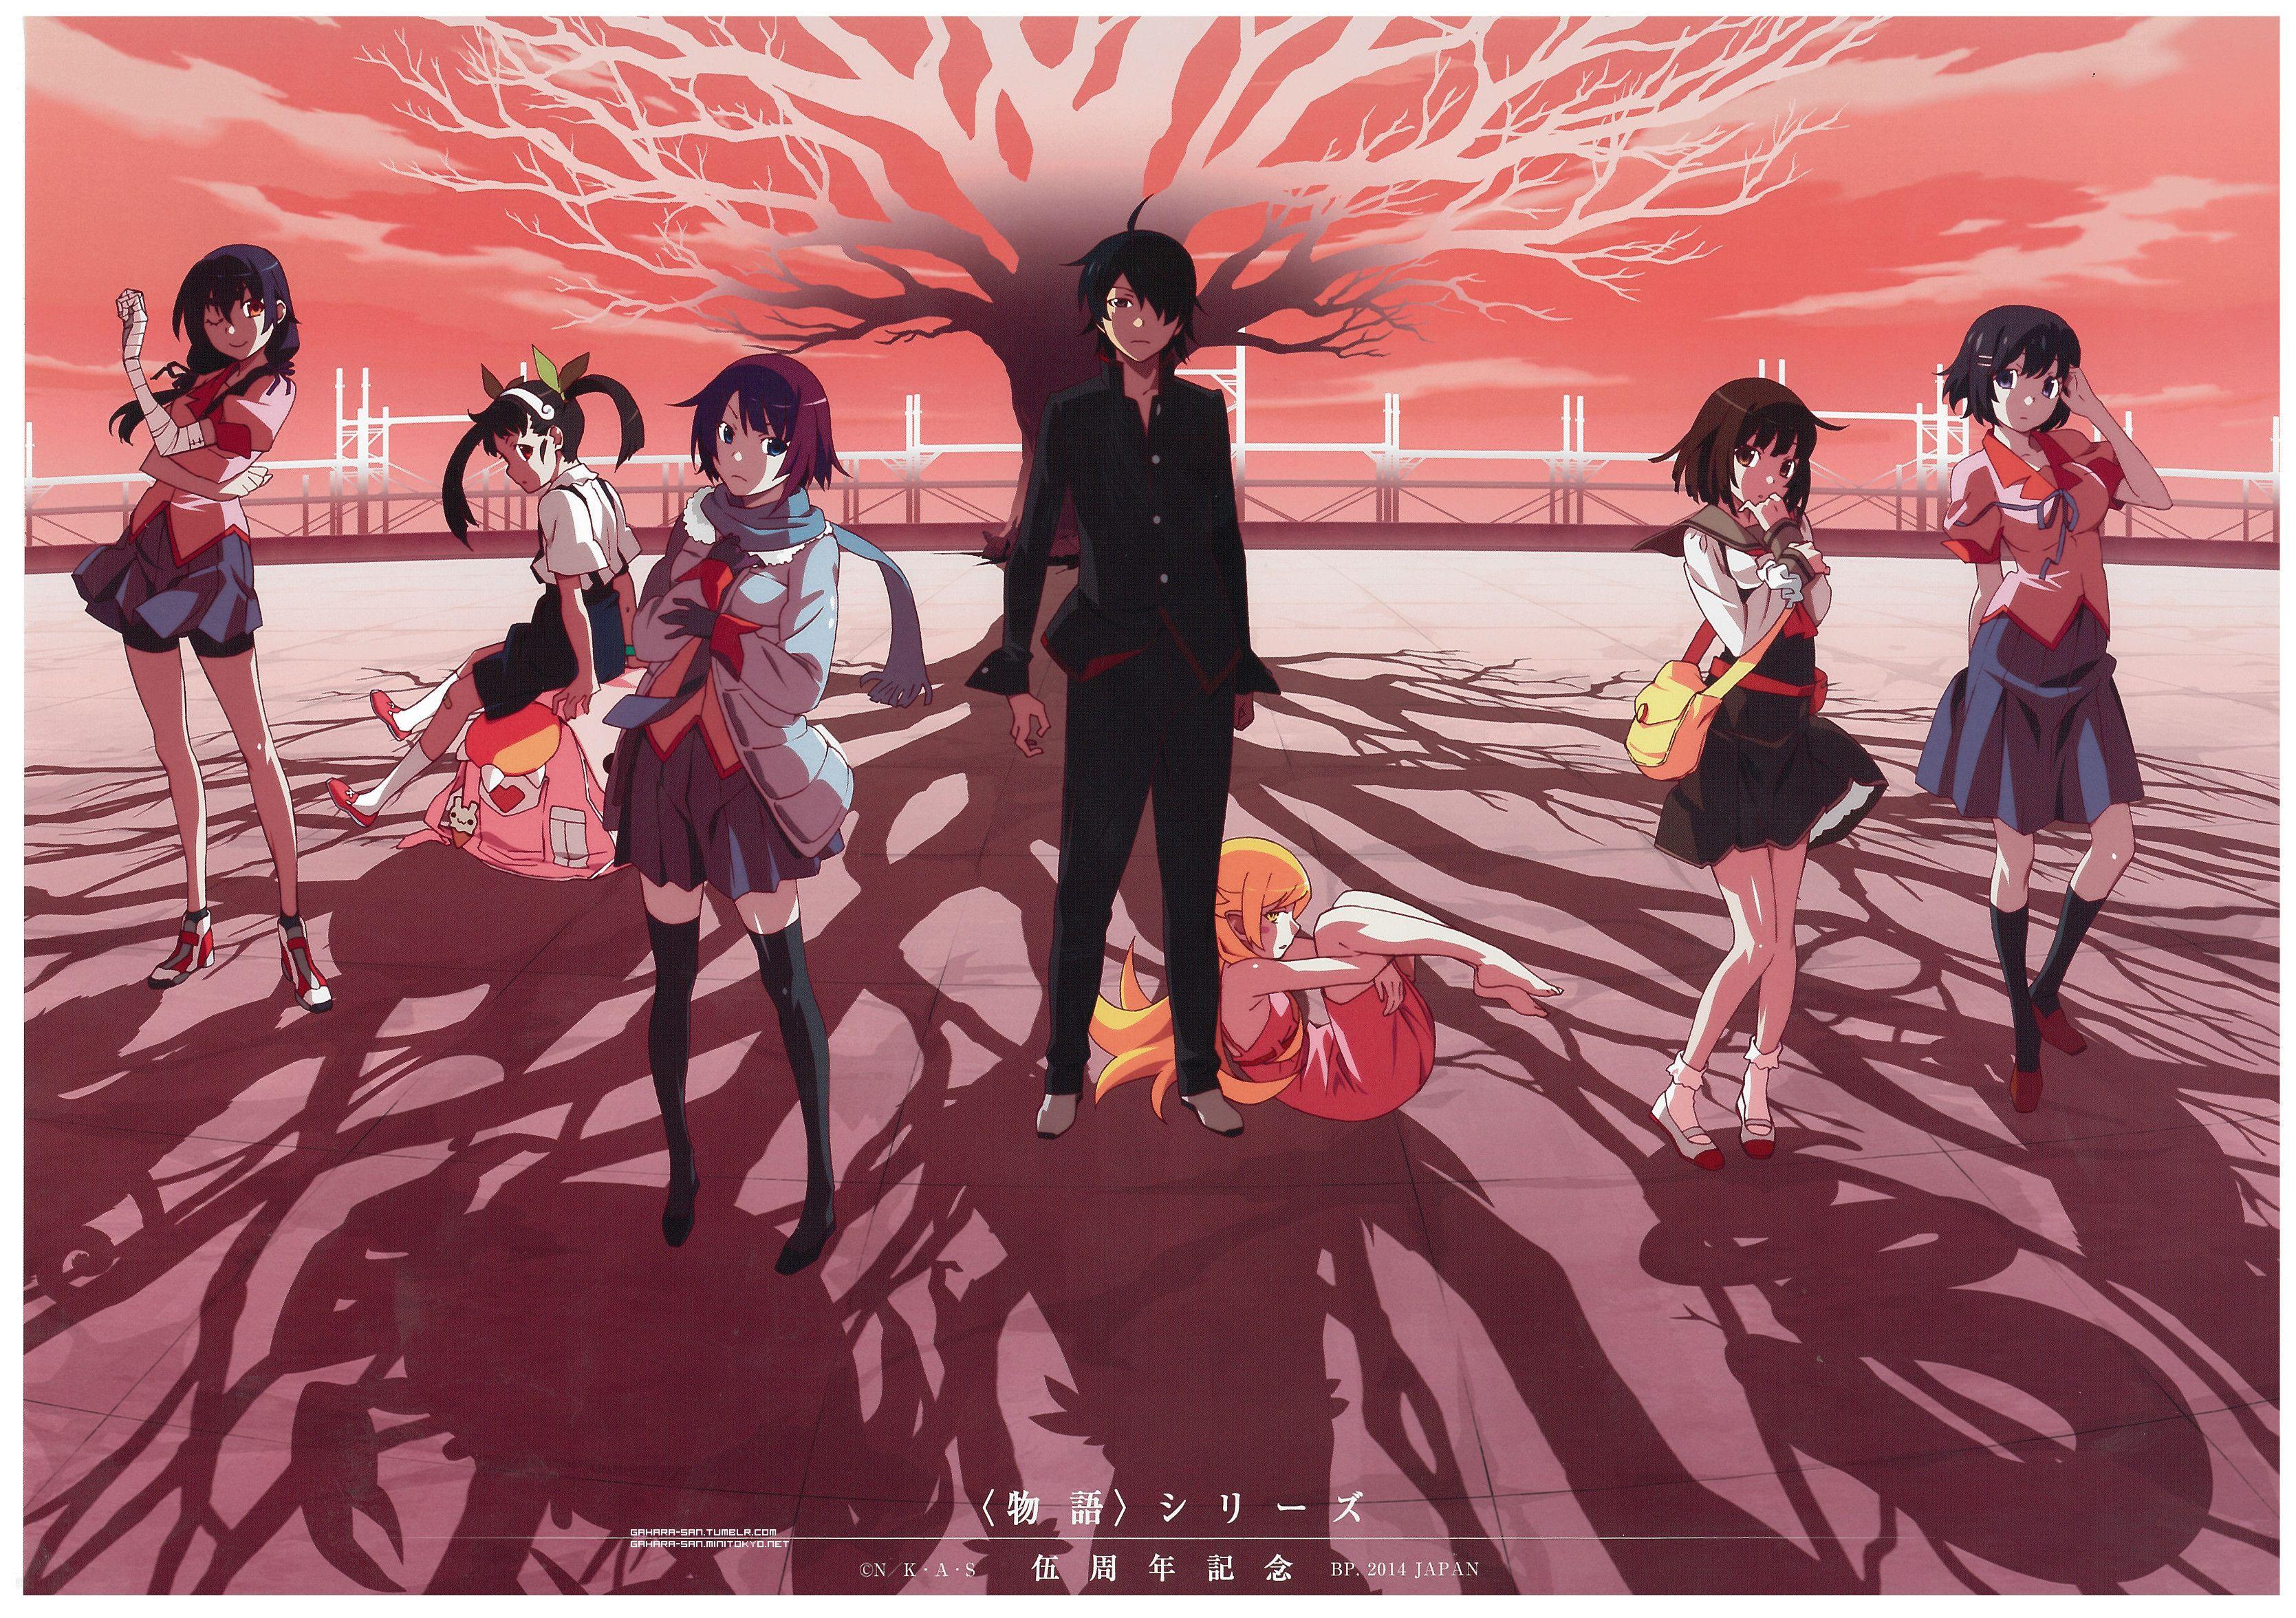 Download Bakemonogatari Monogatari series (3338x2352